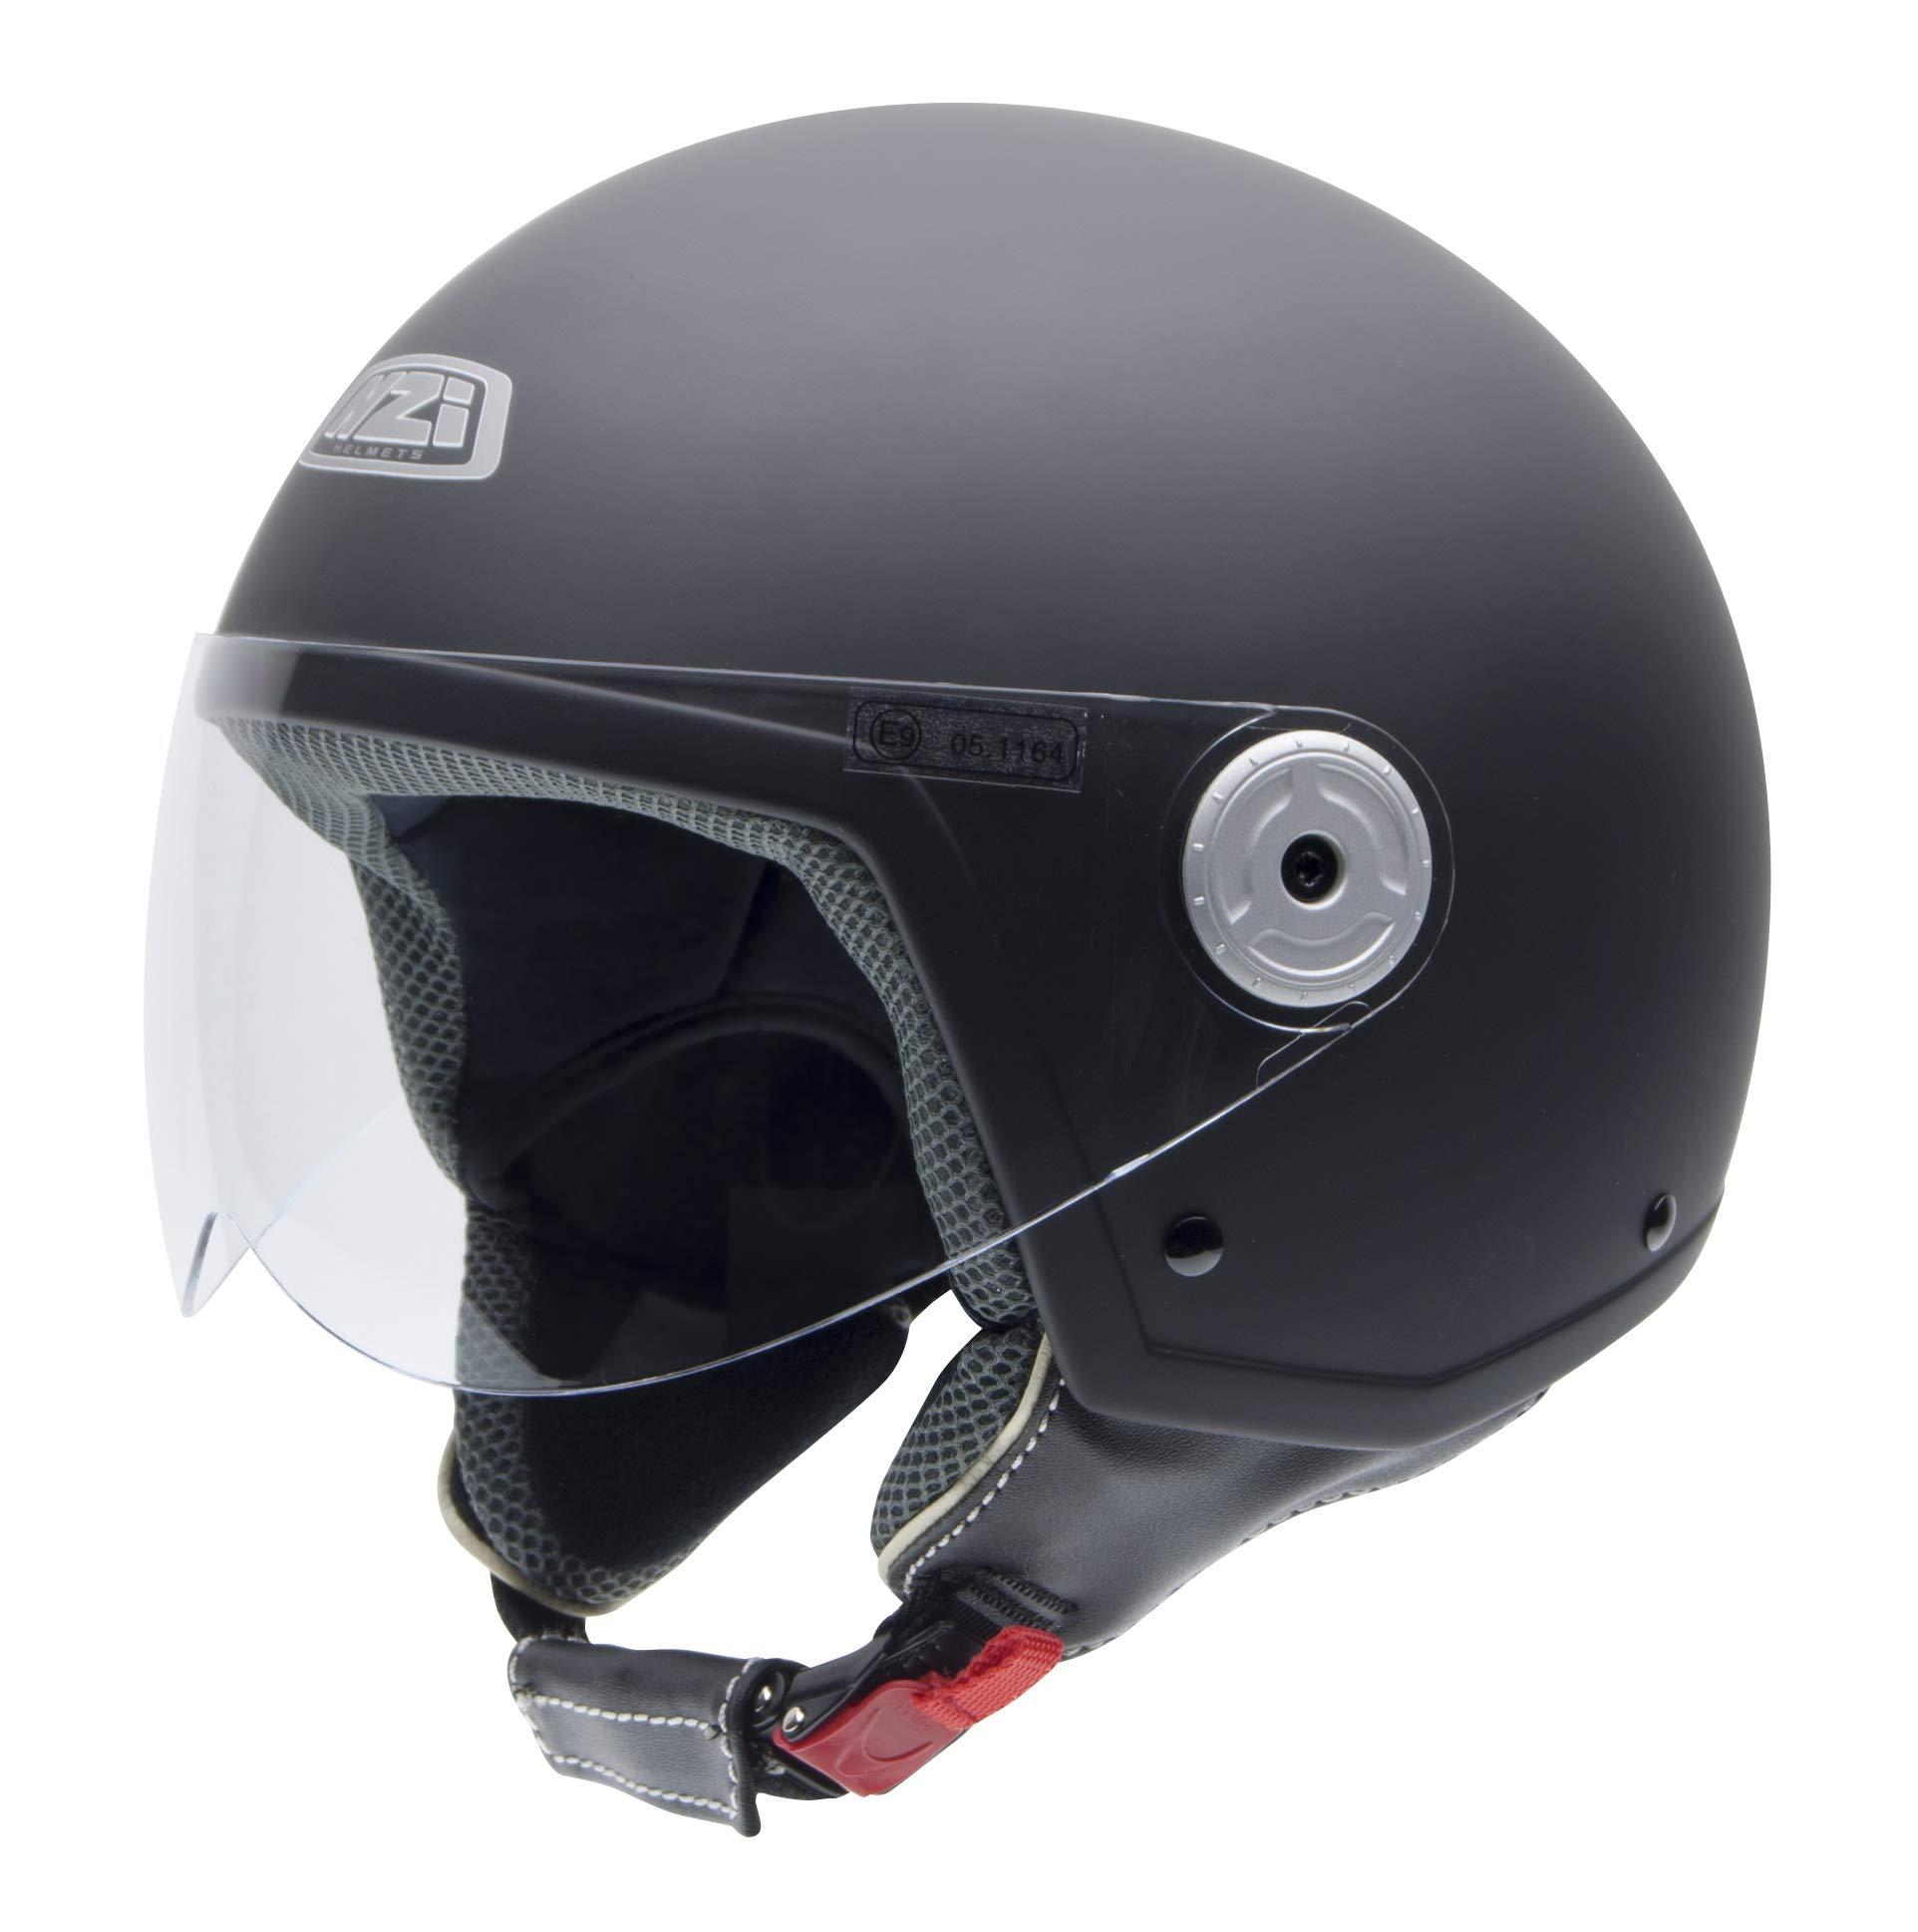 NZI Vintage II Casco de Moto, Negro(Negro Suave), 57 (M